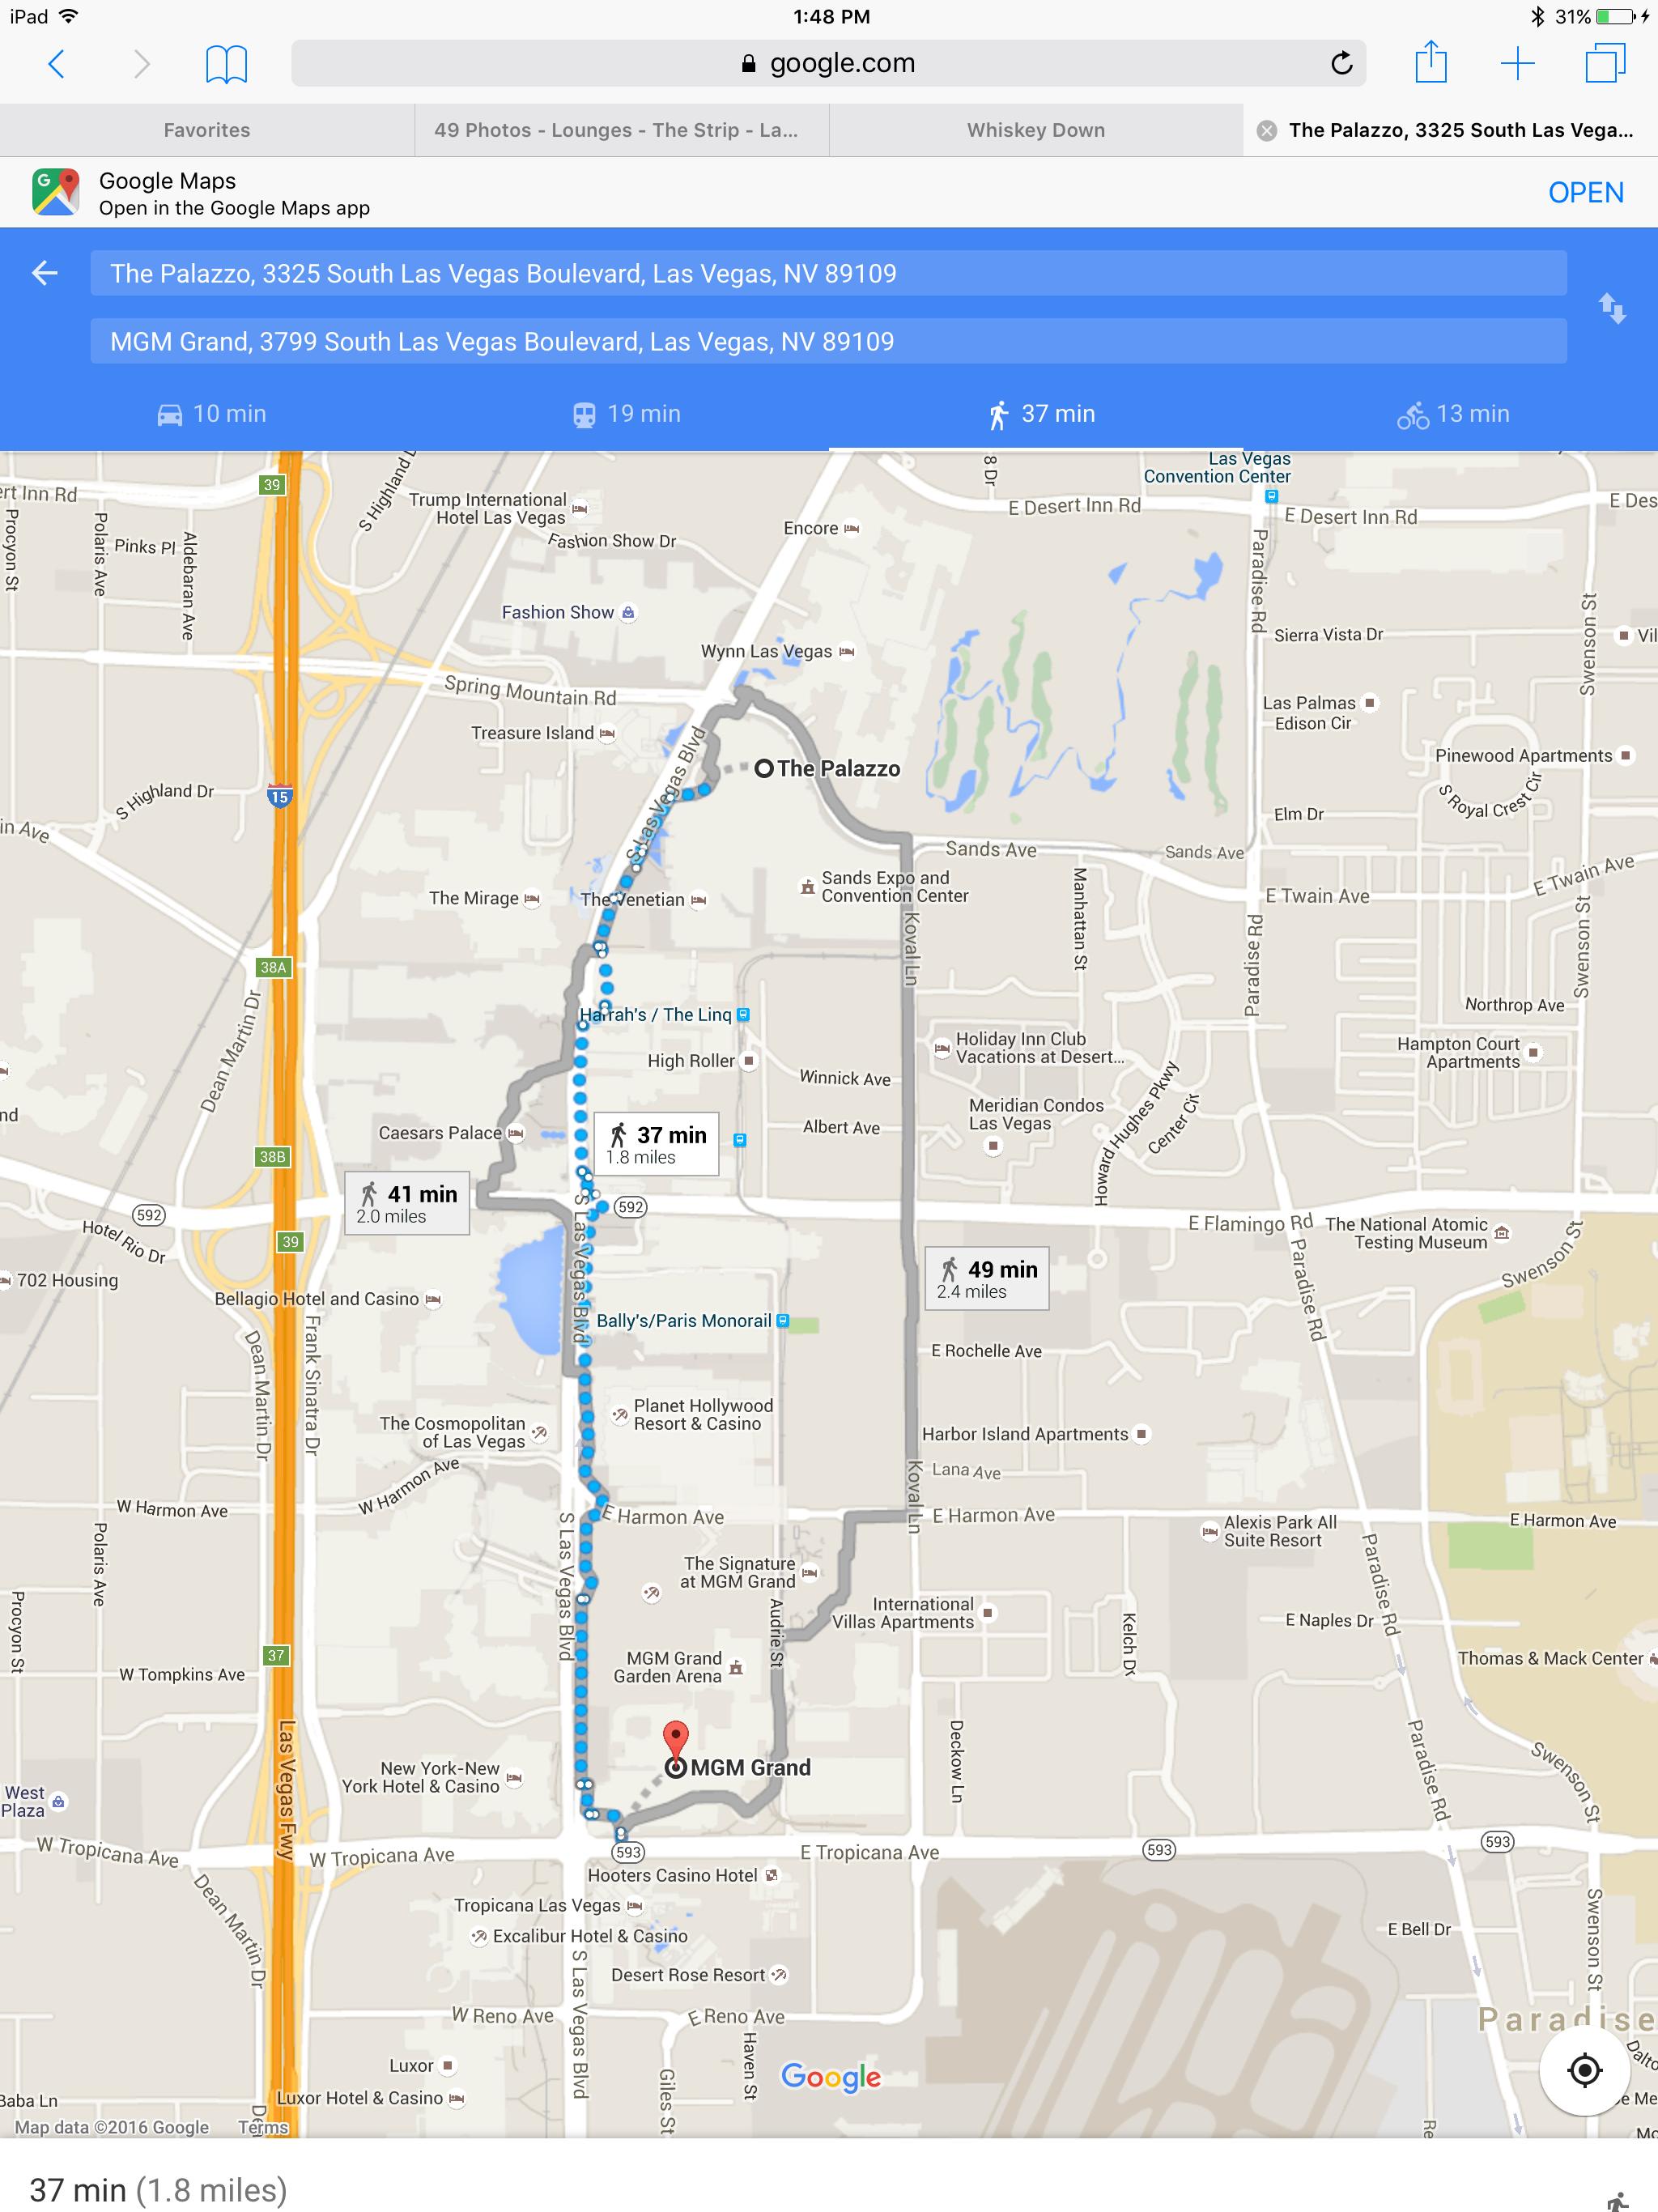 MGM hotel Google maps app, Vegas, I google